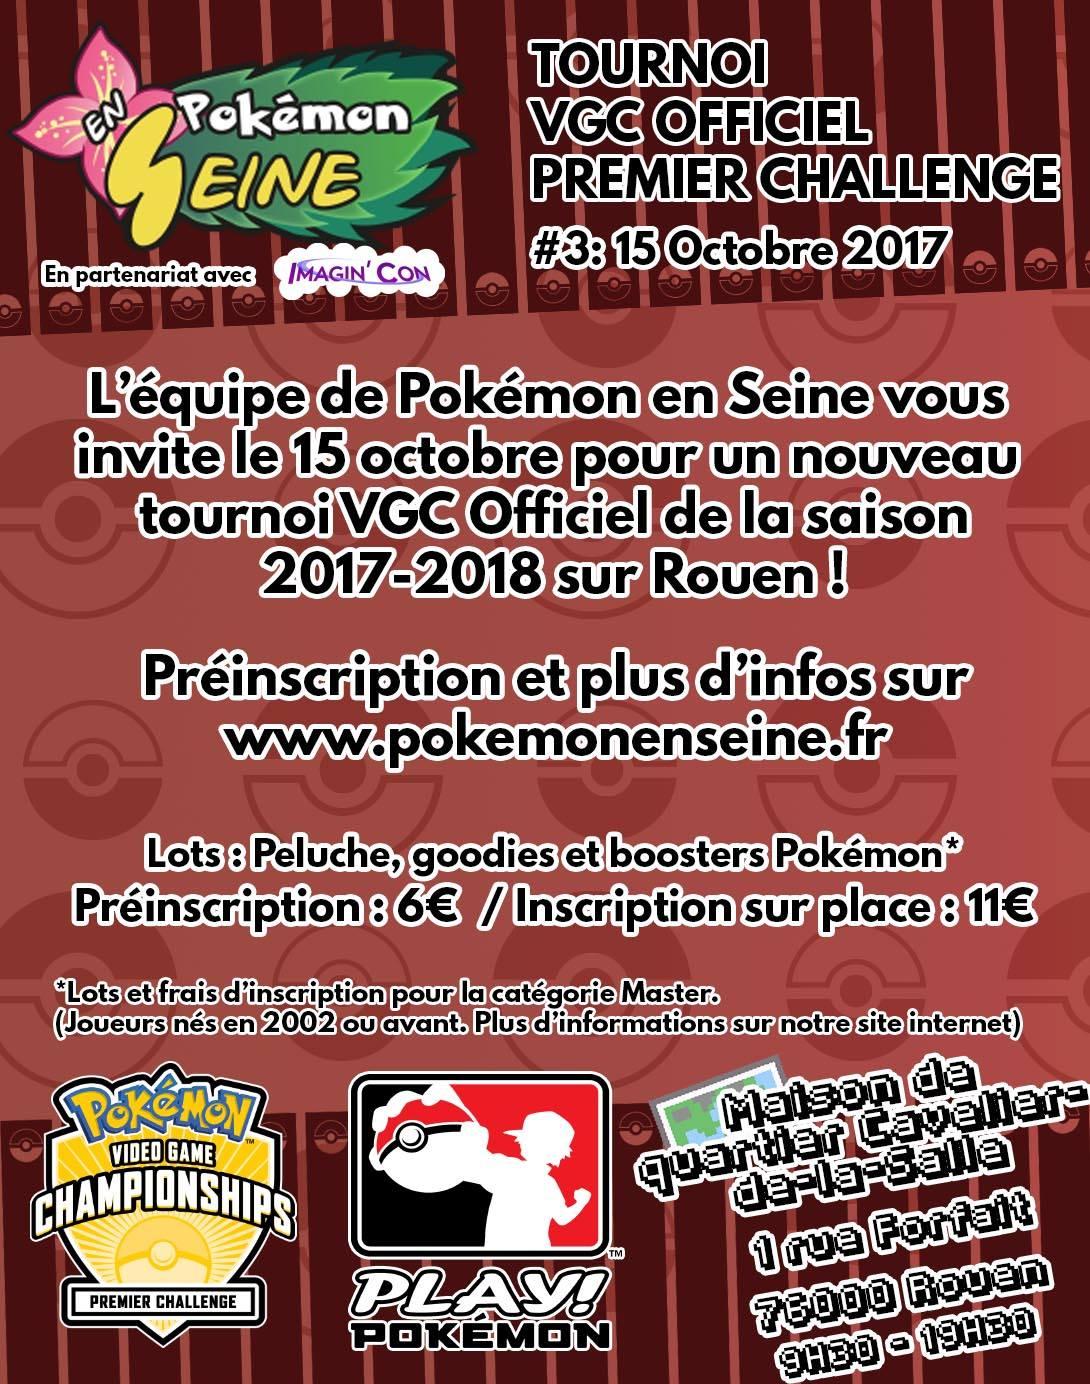 Tournoi VGC Pokémon en Seine le 15 Octobre prochain